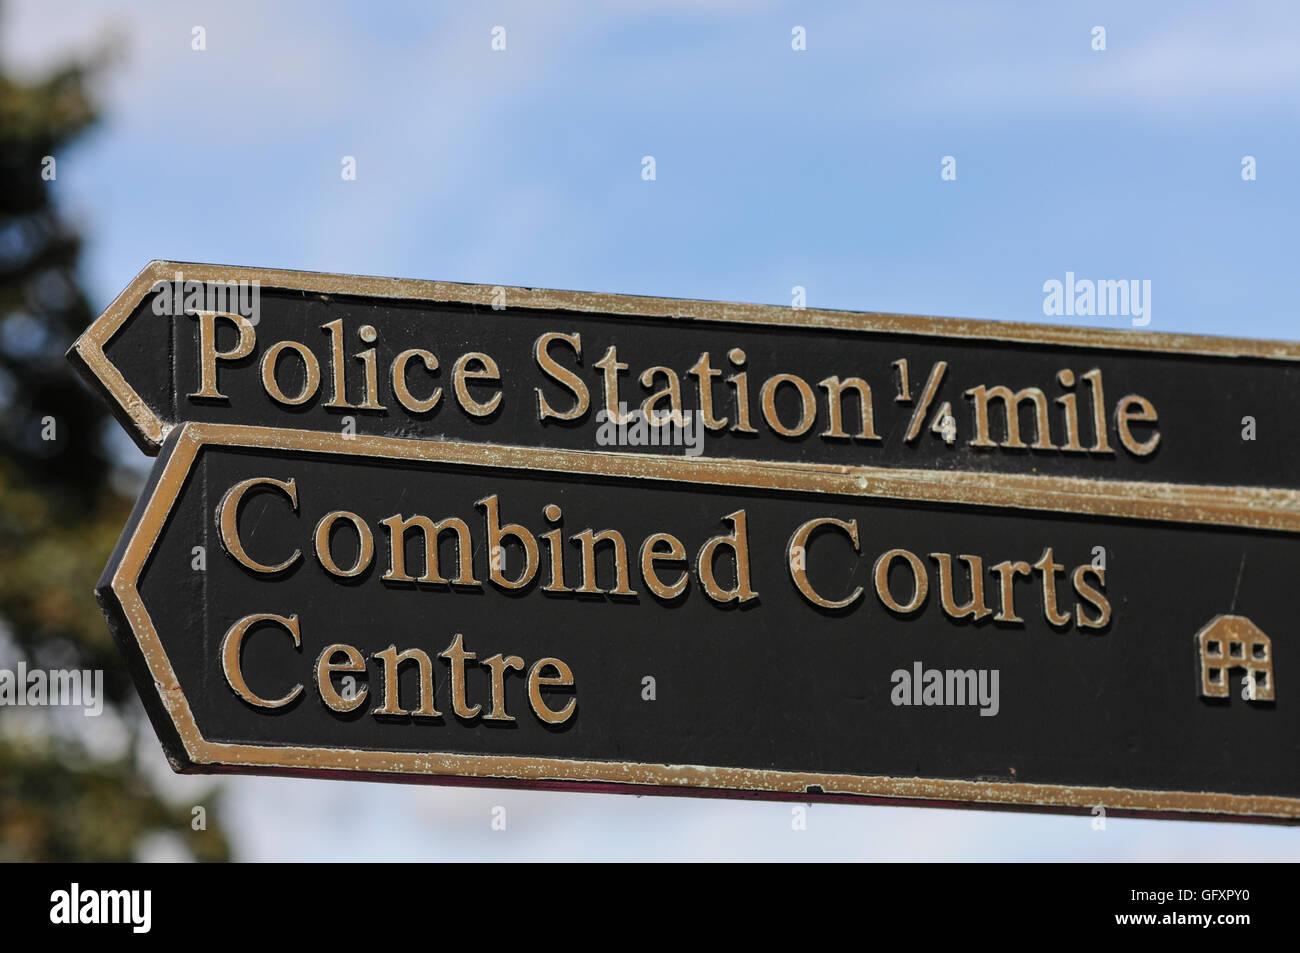 Northampton Crown County Courts - Stock Image